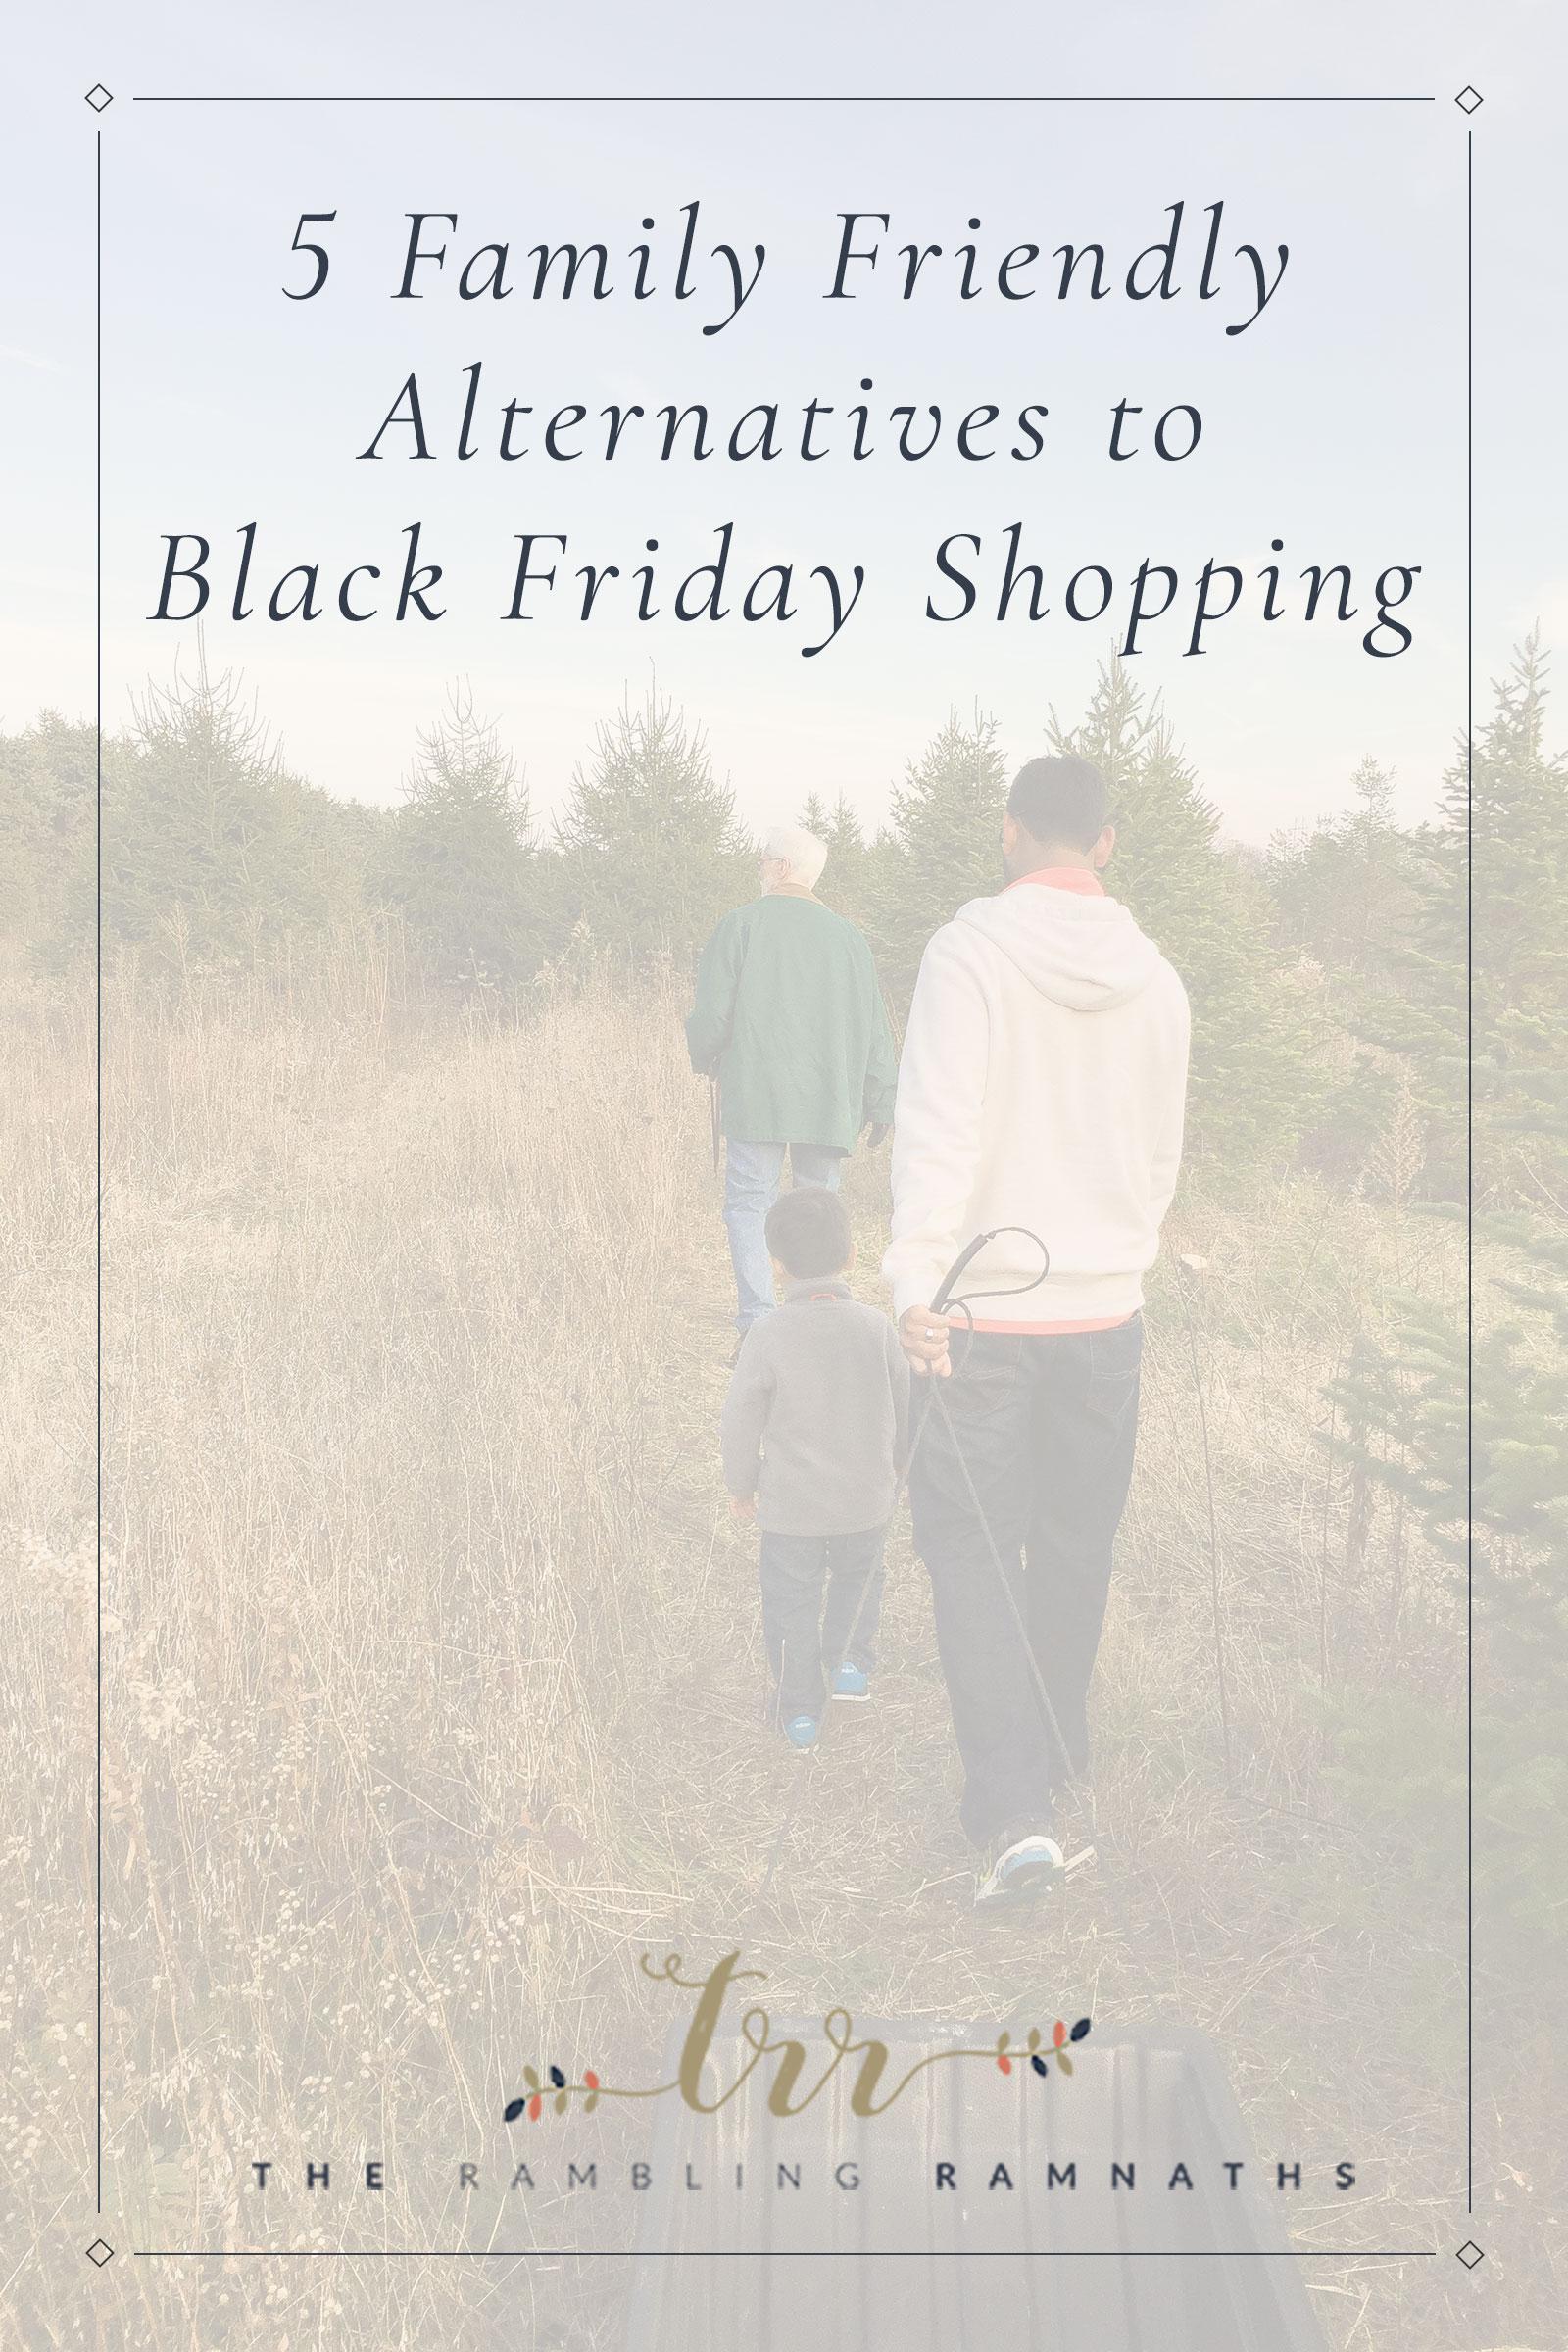 5 Family Fun Alternatives to Black Friday Shopping